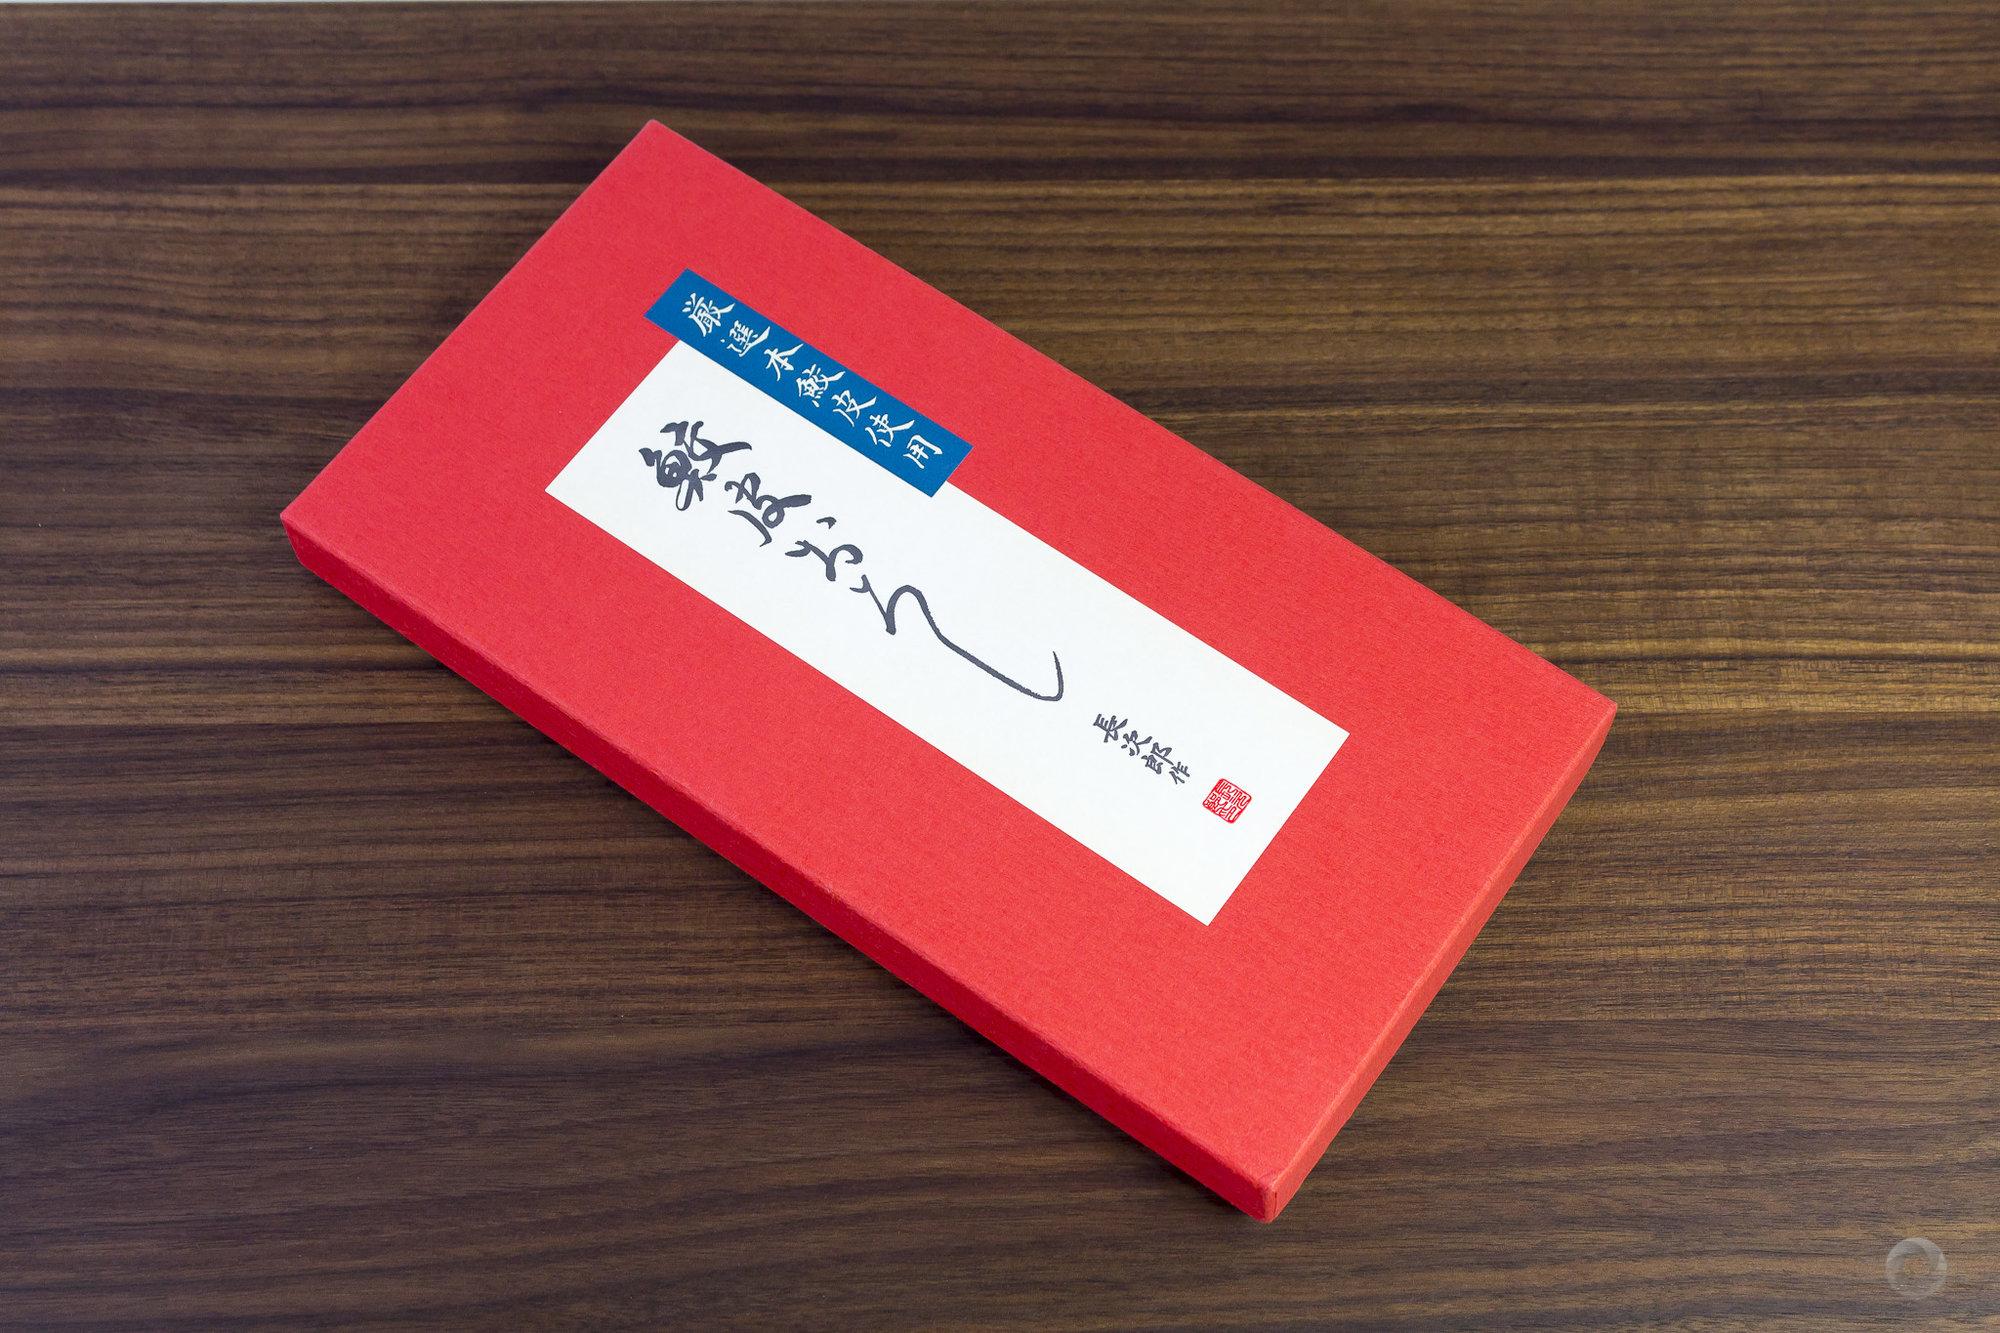 31-2017-10-01 Wasabireibe.jpg